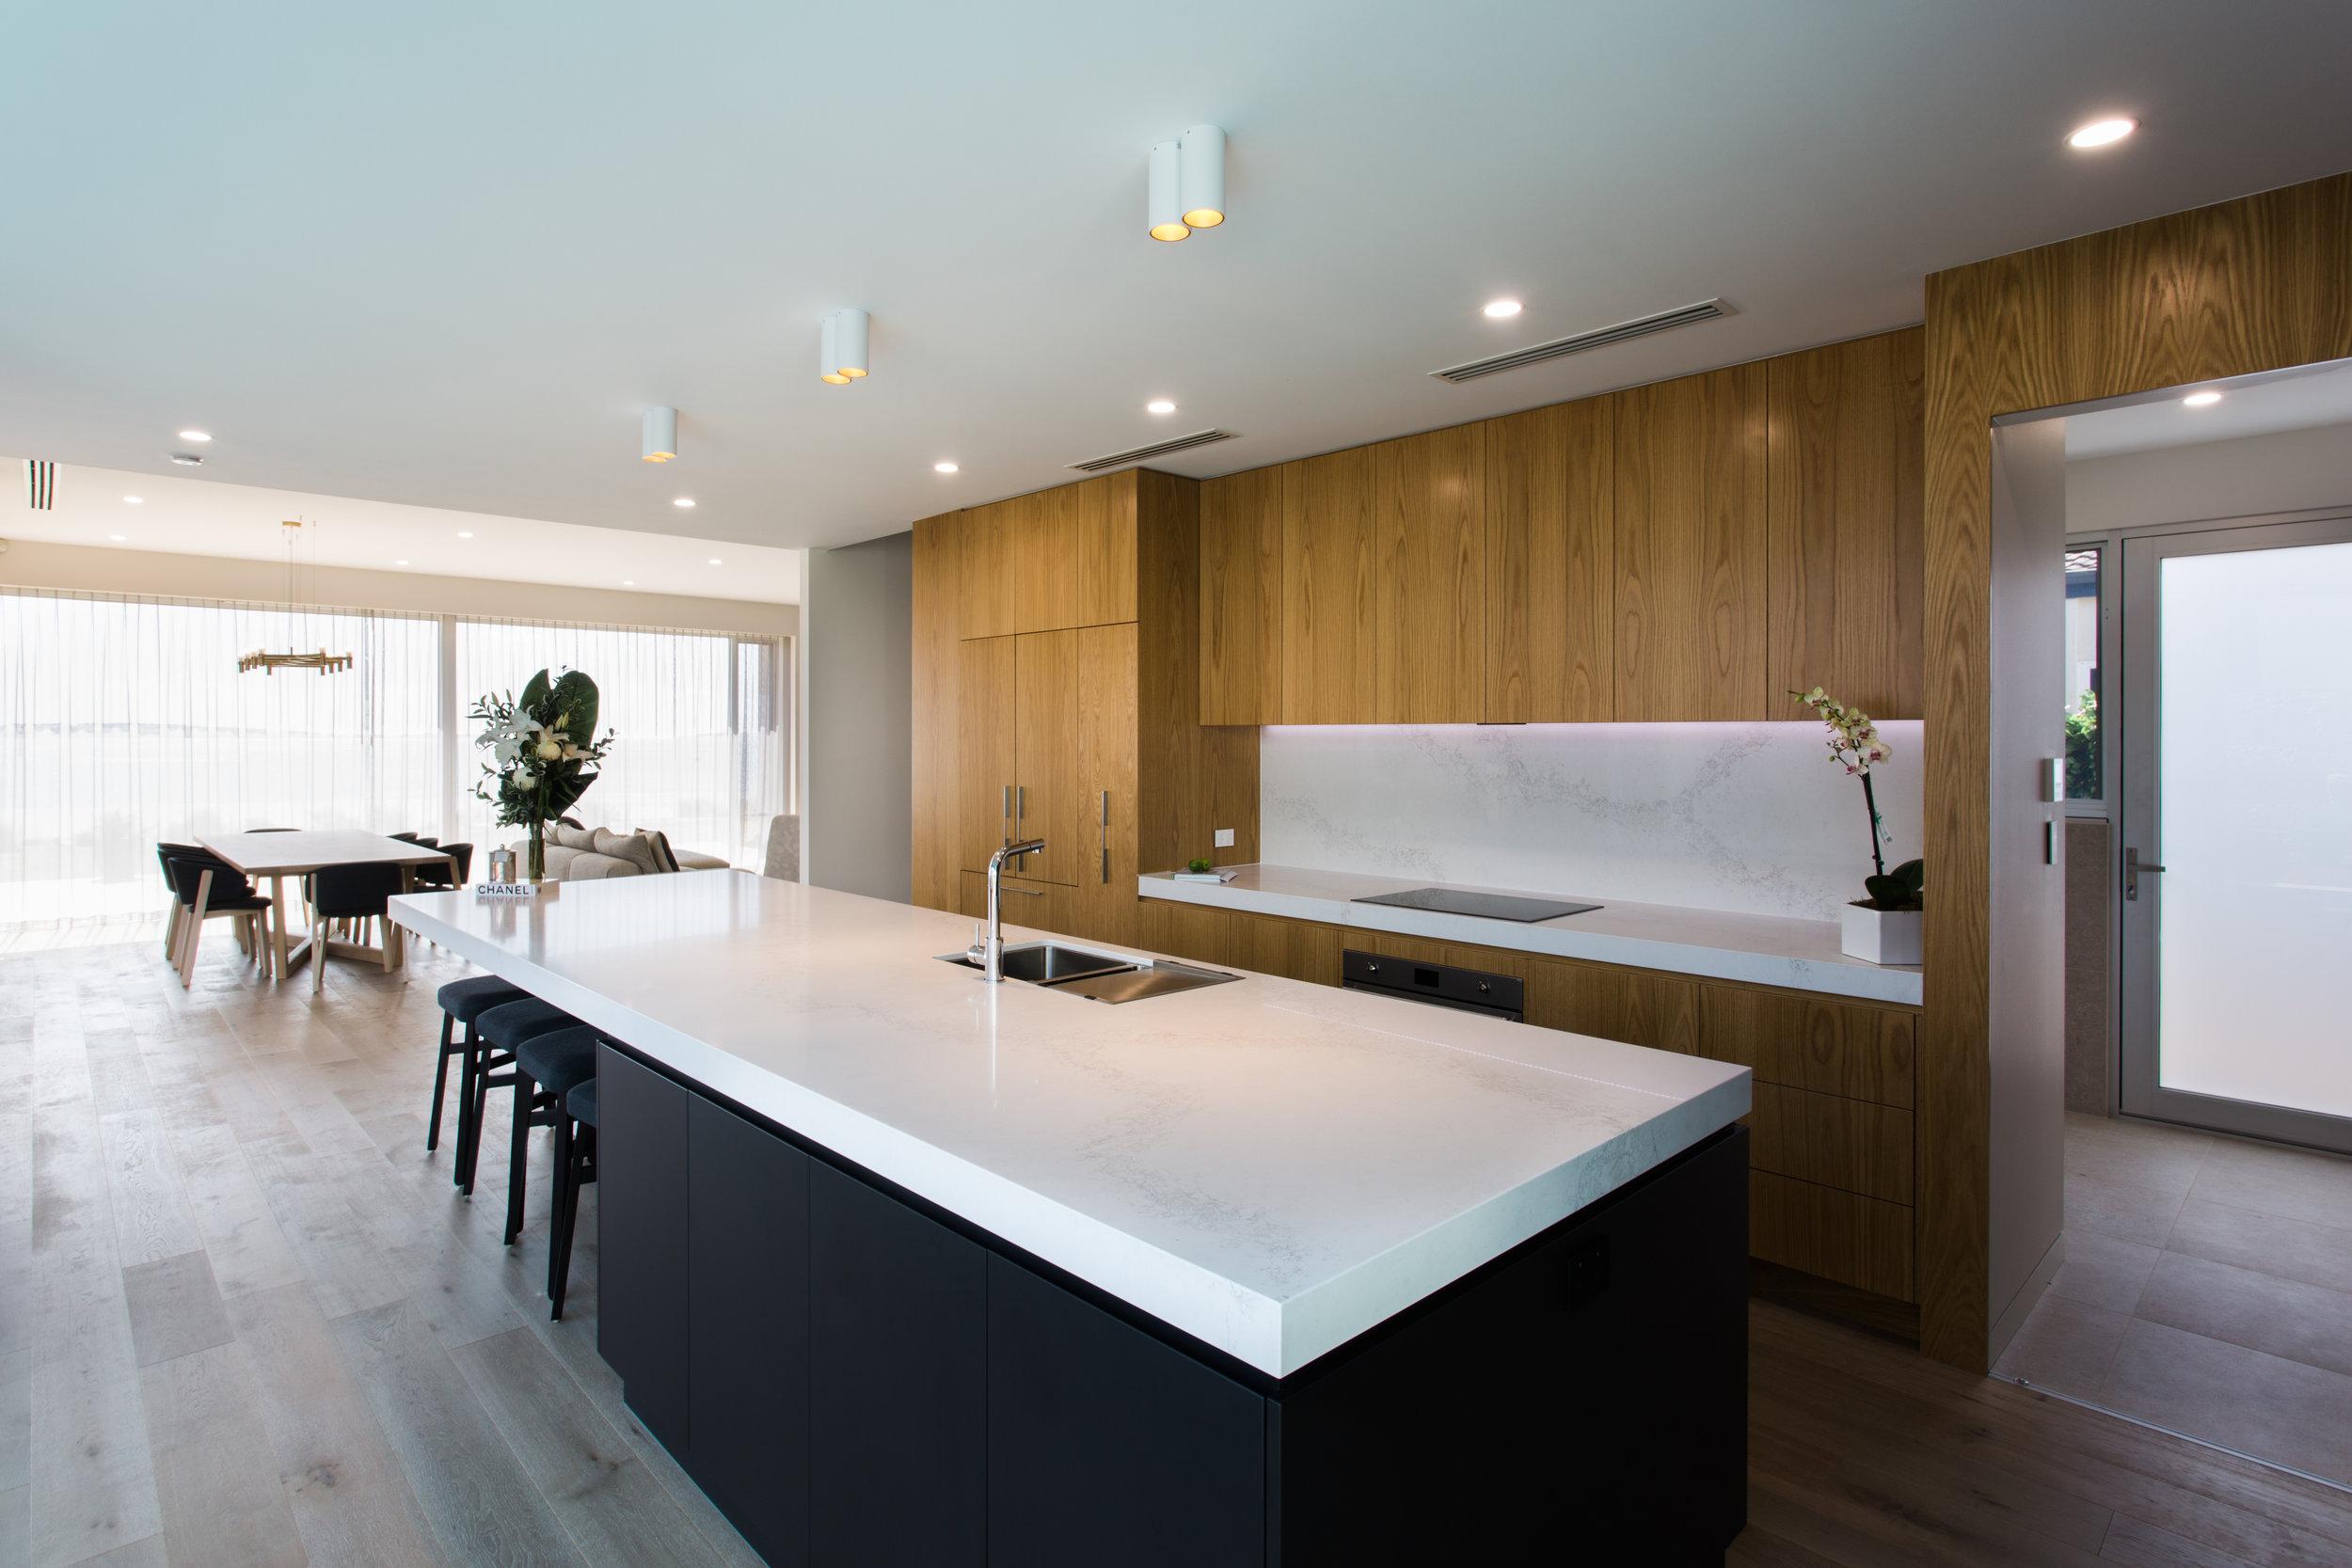 kitchenlookingbacktodining striplightonsplashback.jpg